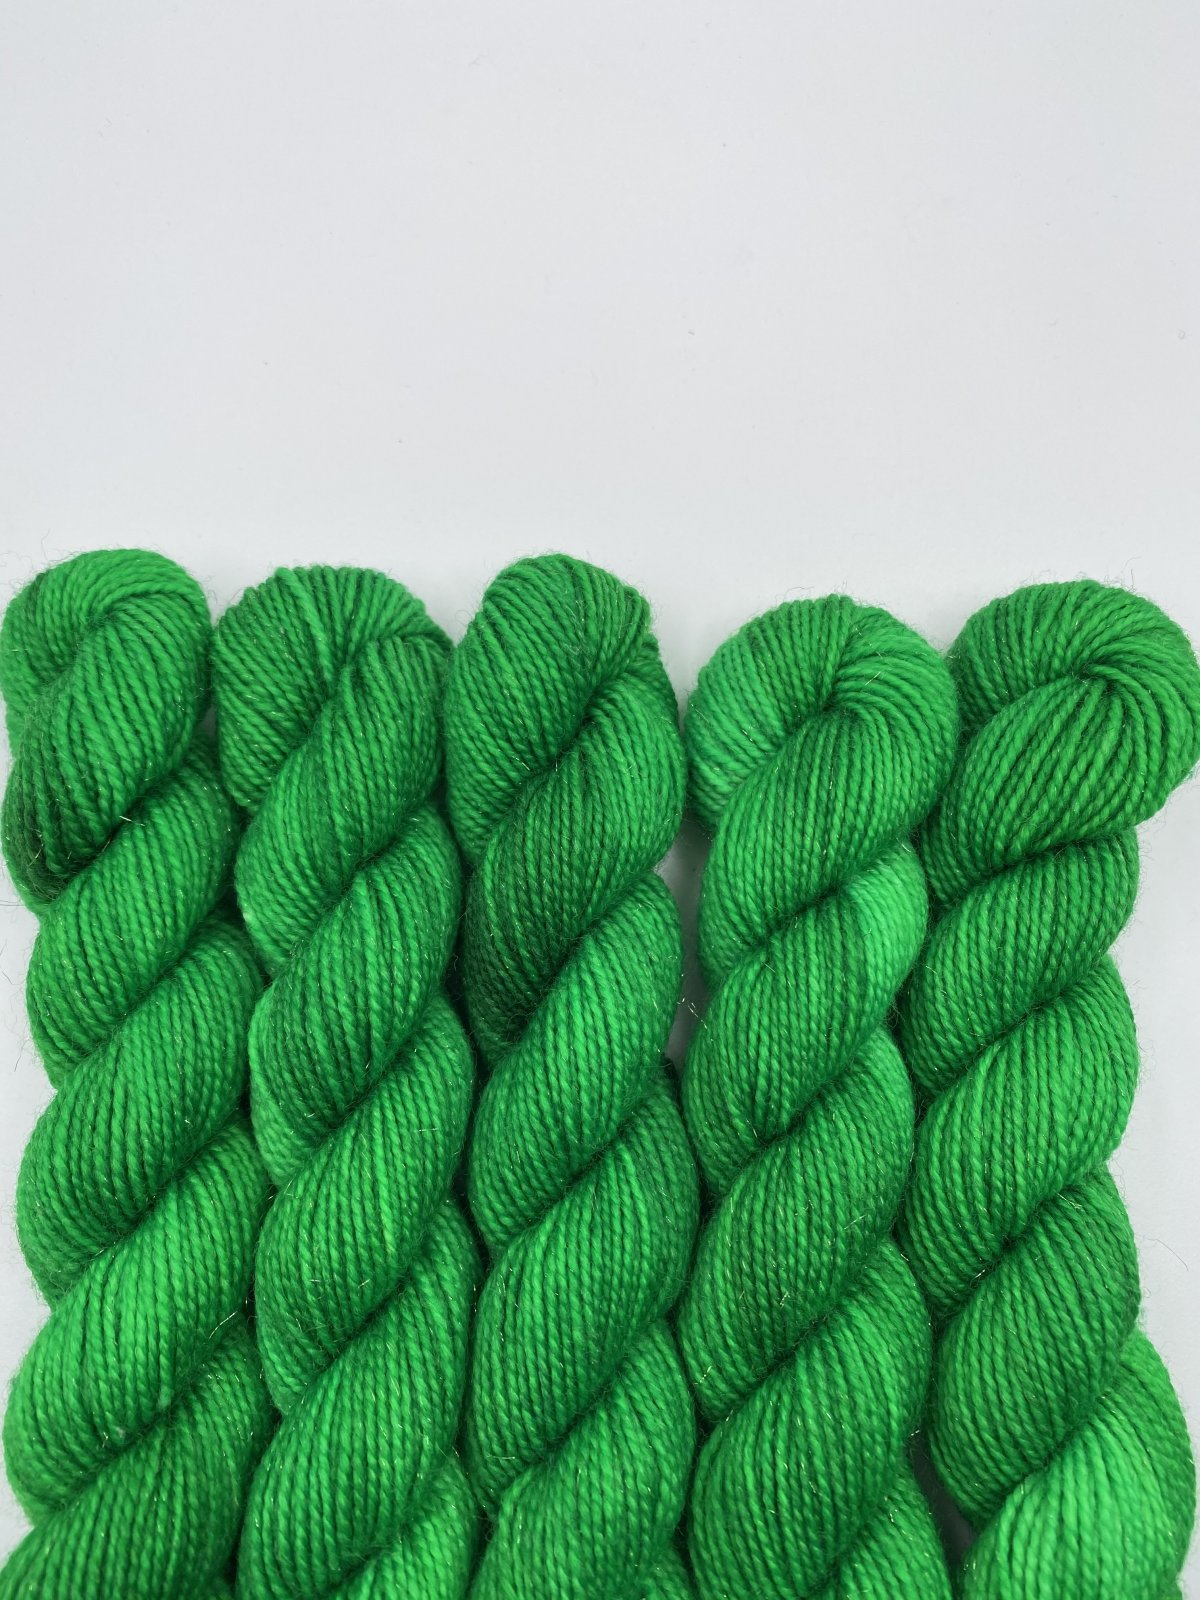 Asylum Fibers Stardust Sock MINI - Emerald City